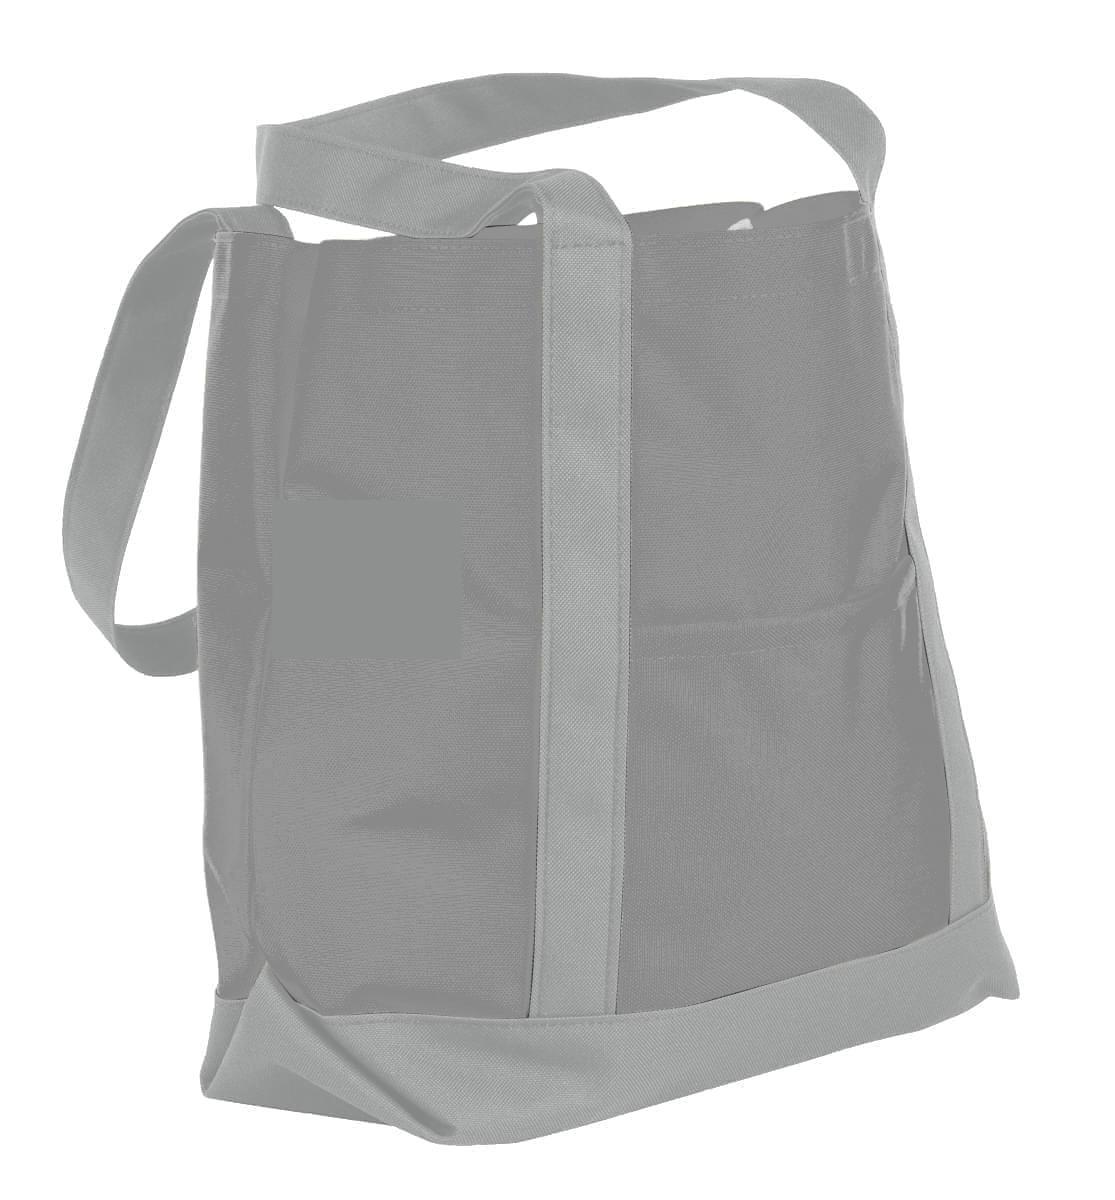 USA Made Nylon Poly Boat Tote Bags, Grey-Grey, XAACL1UA1N